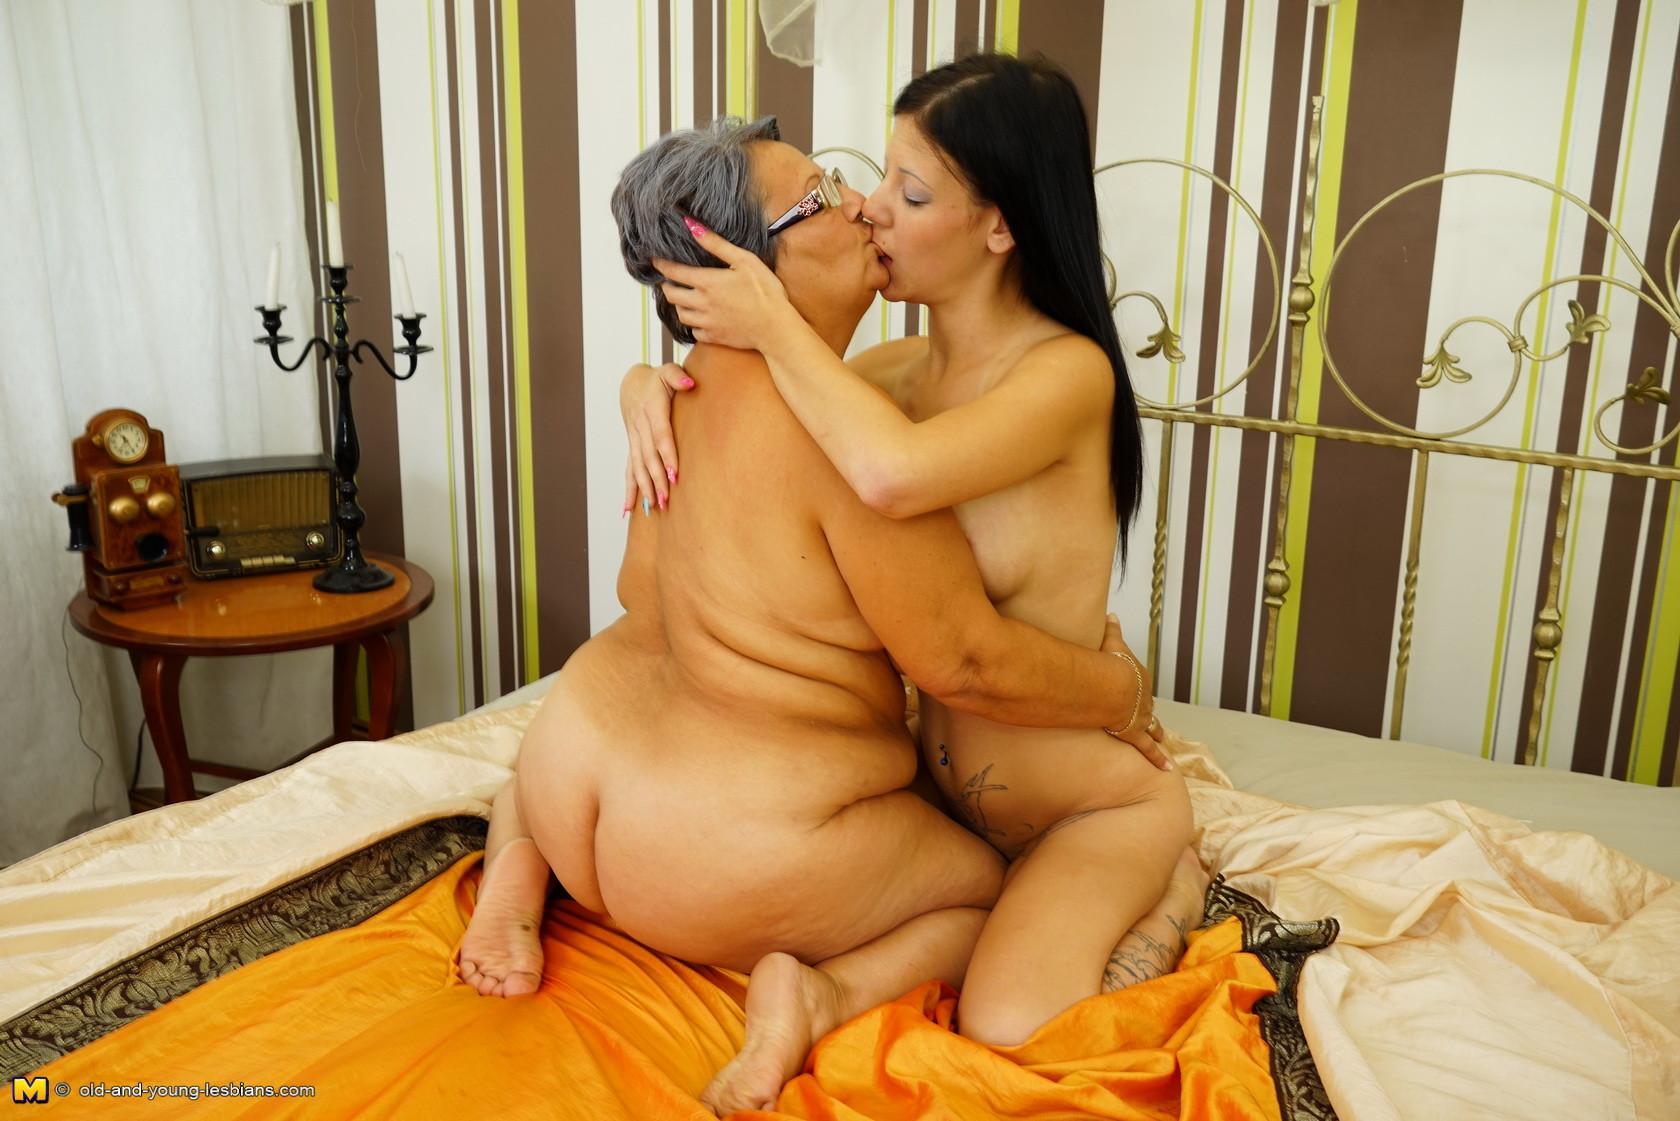 Lesbian Milf Seduces Daughter